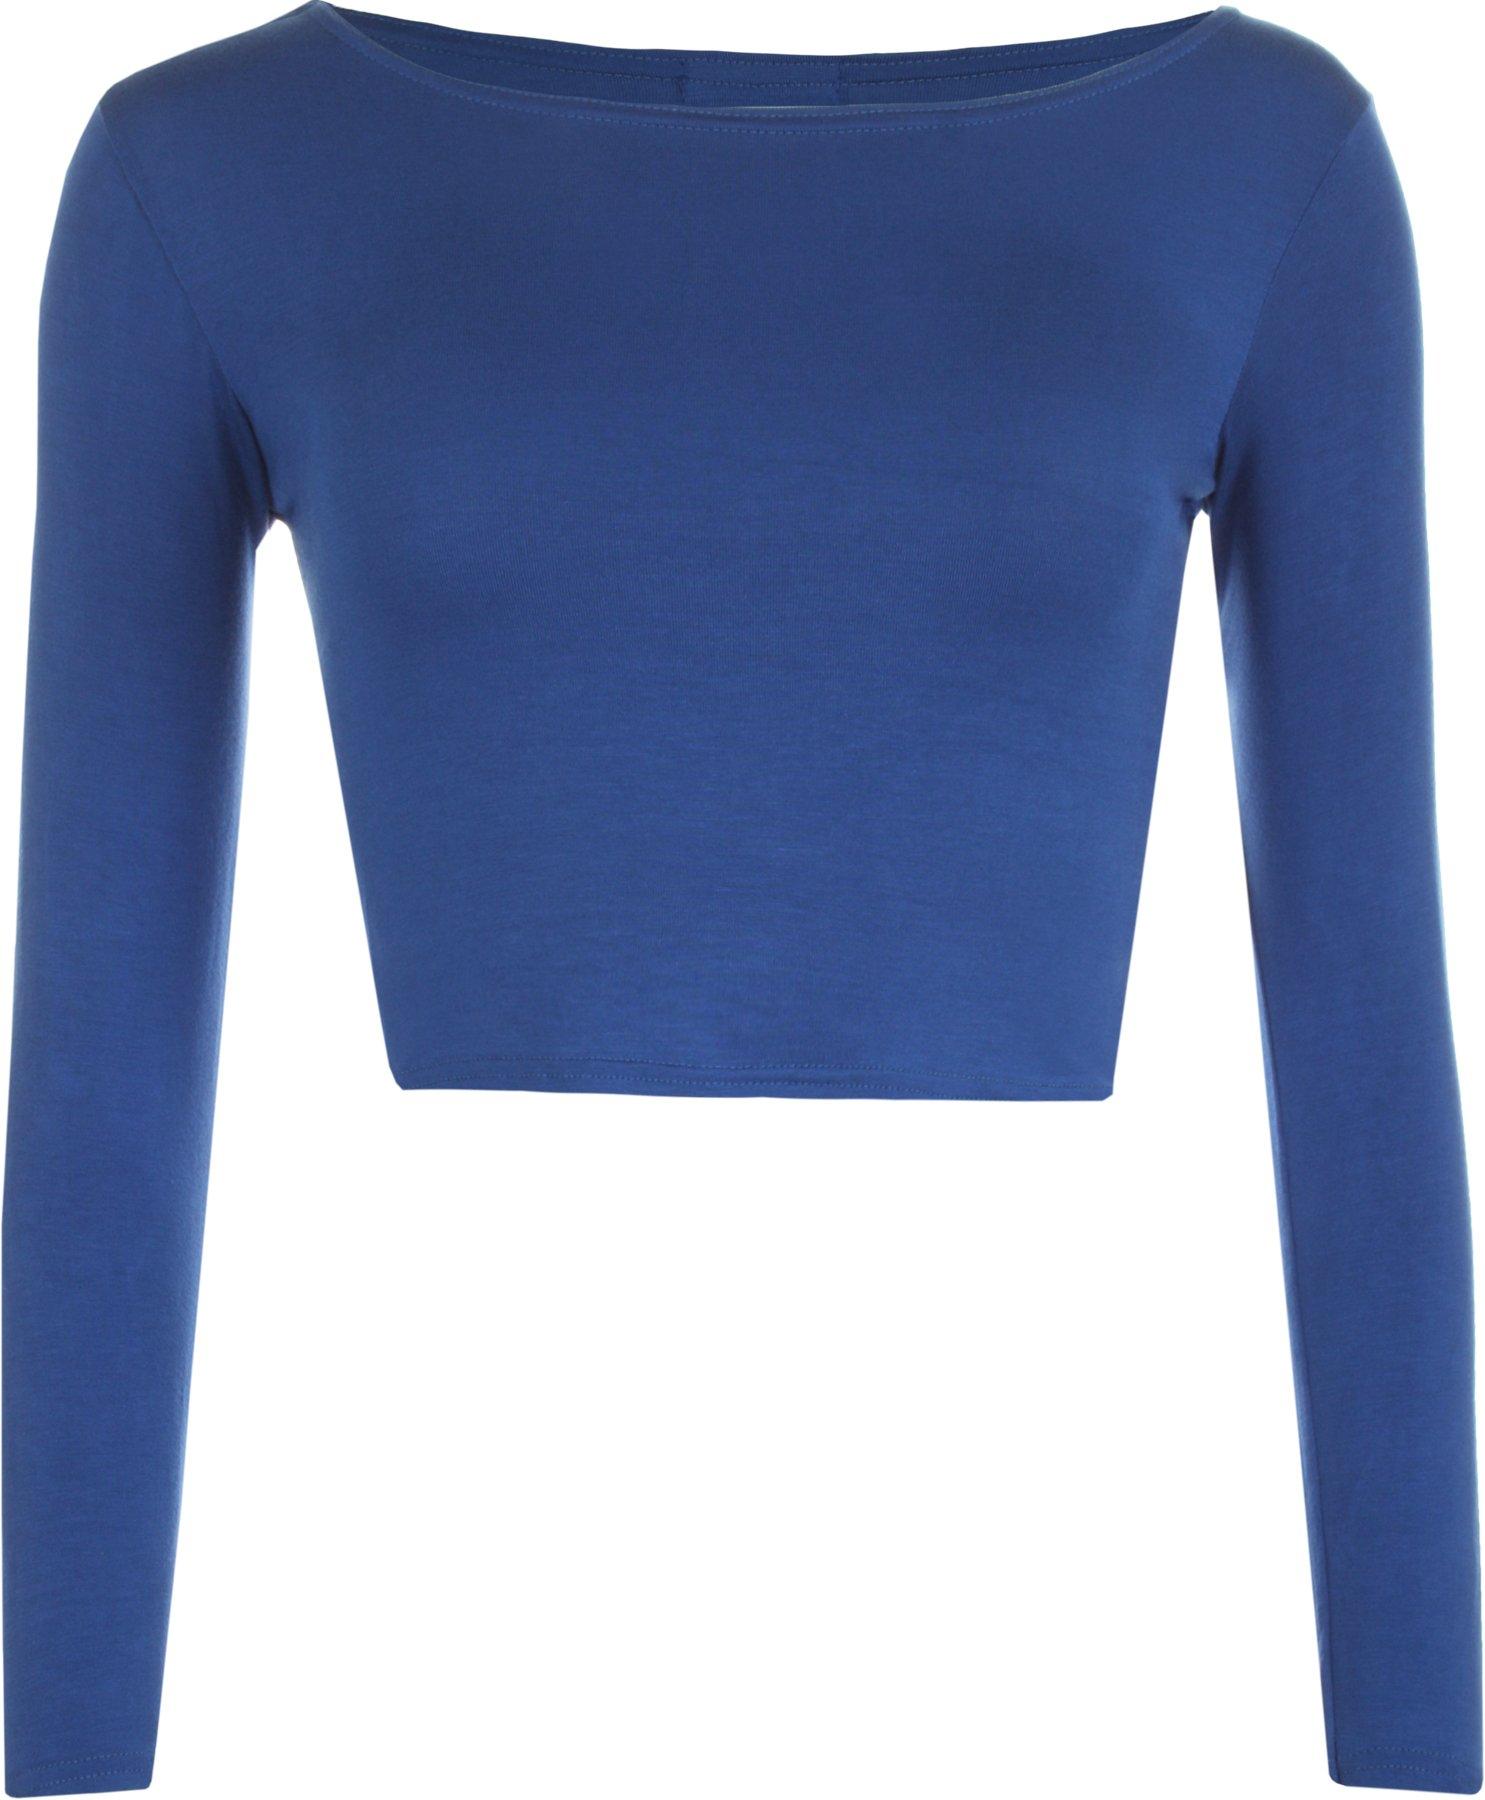 WearAll Women's Crop Long Sleeve Ladies Plain T-Shirt Top - Royal Blue - US 8-10 (UK 12-14)